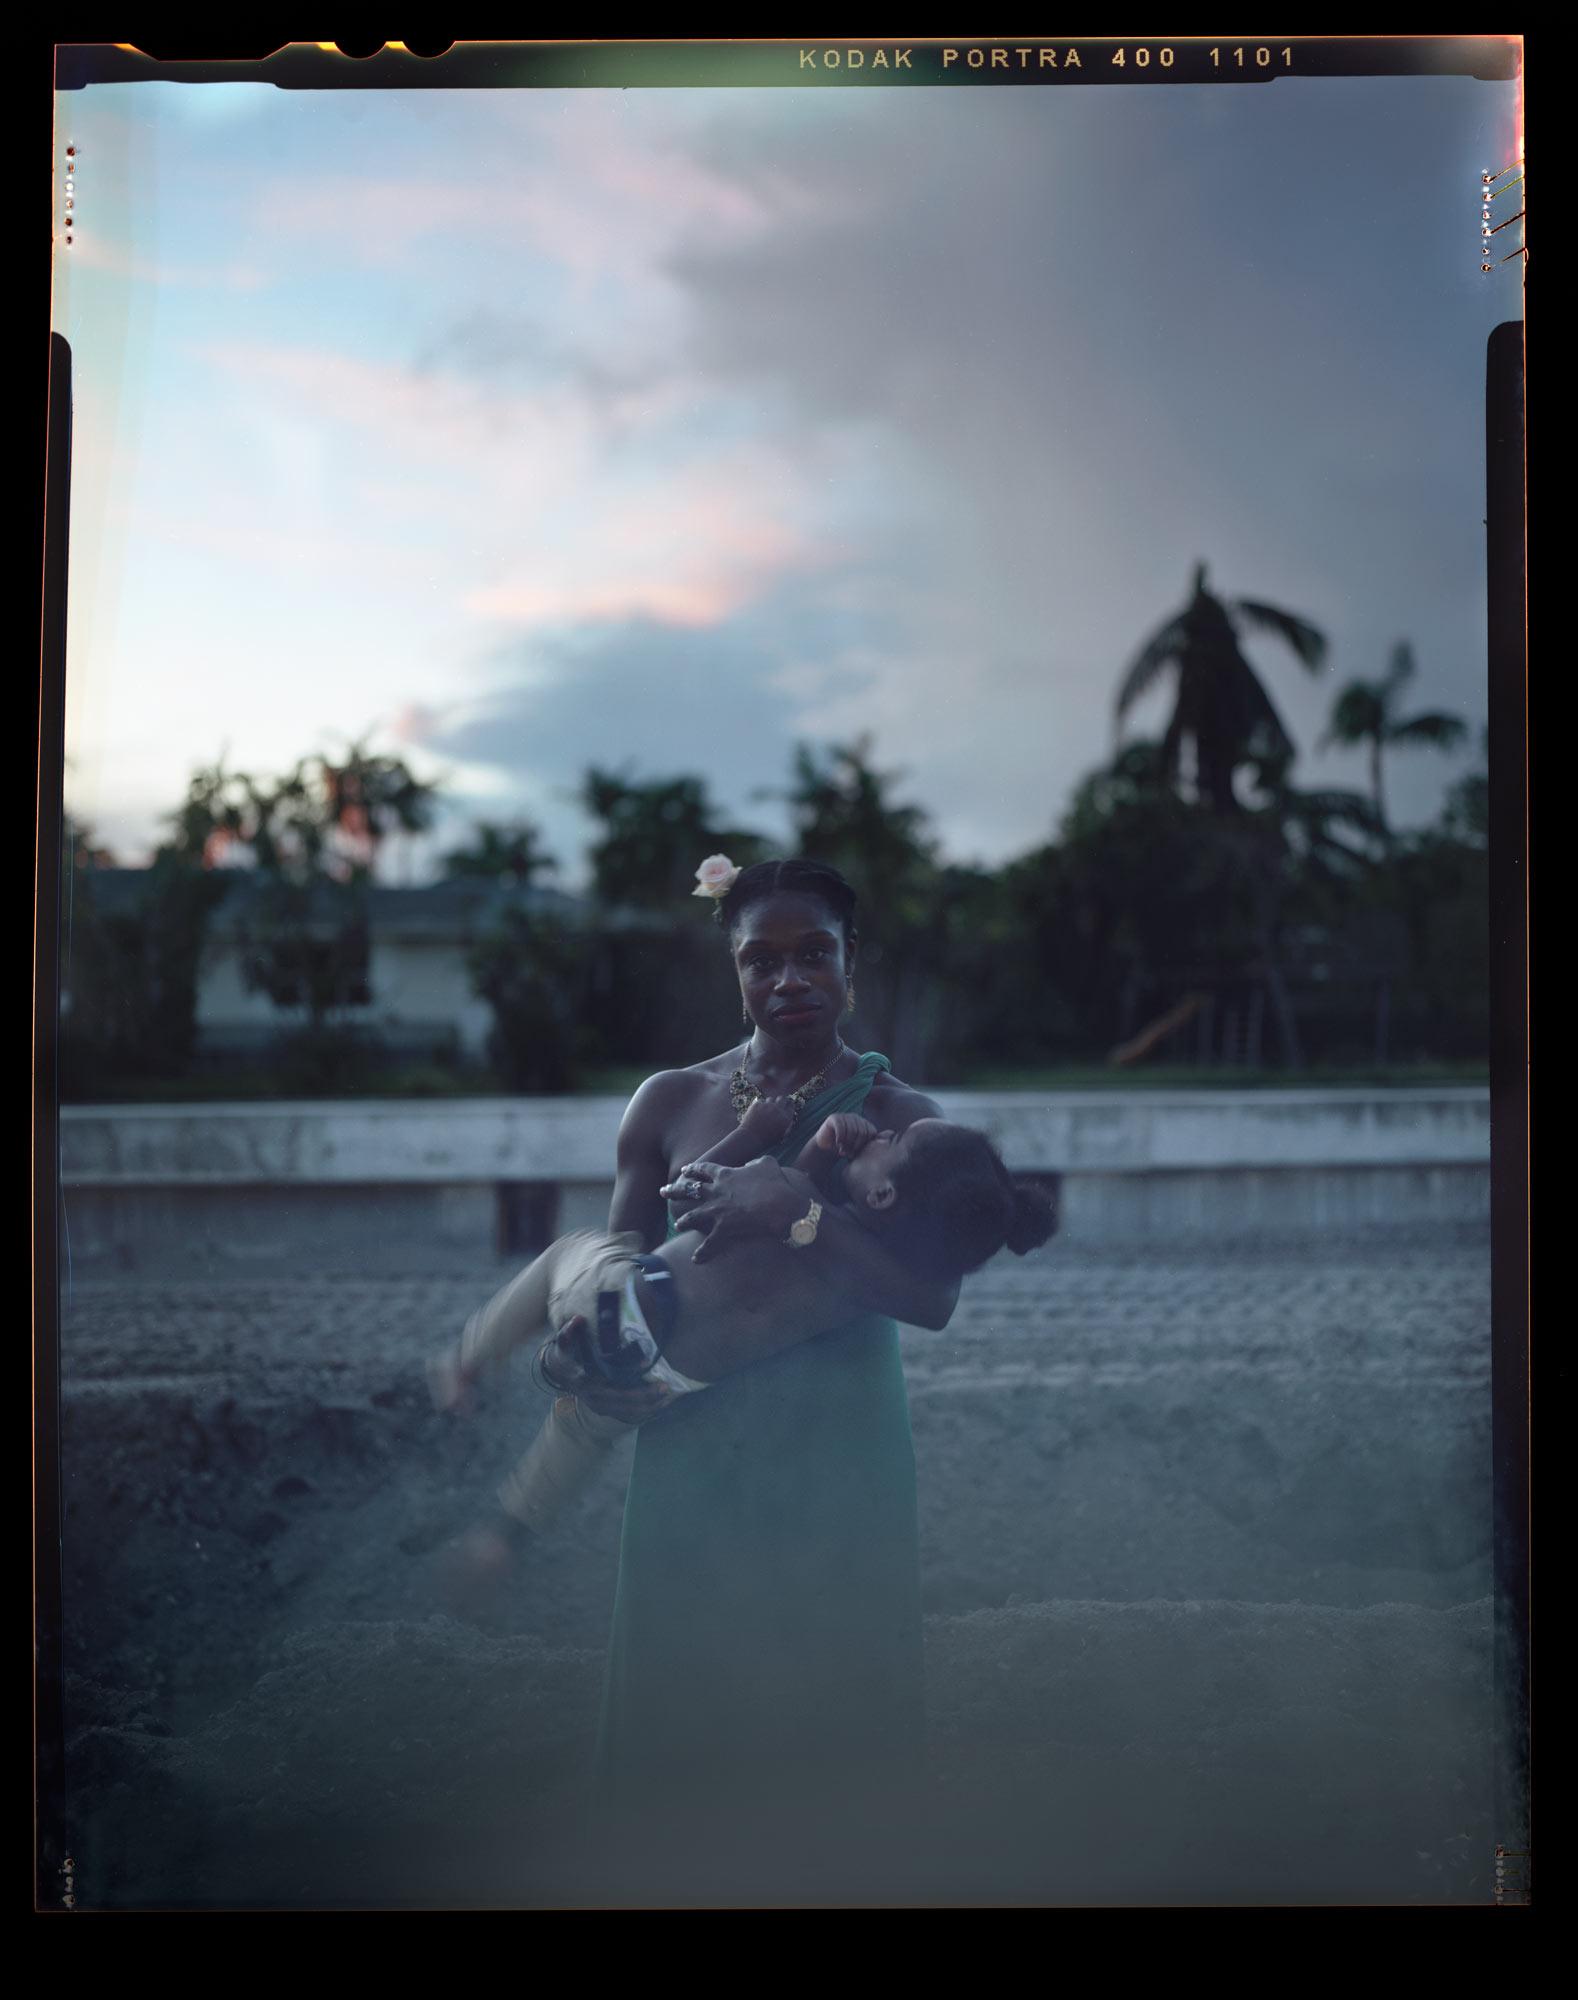 Untitled #26, Miami Beach, FL 24 x 30 inches